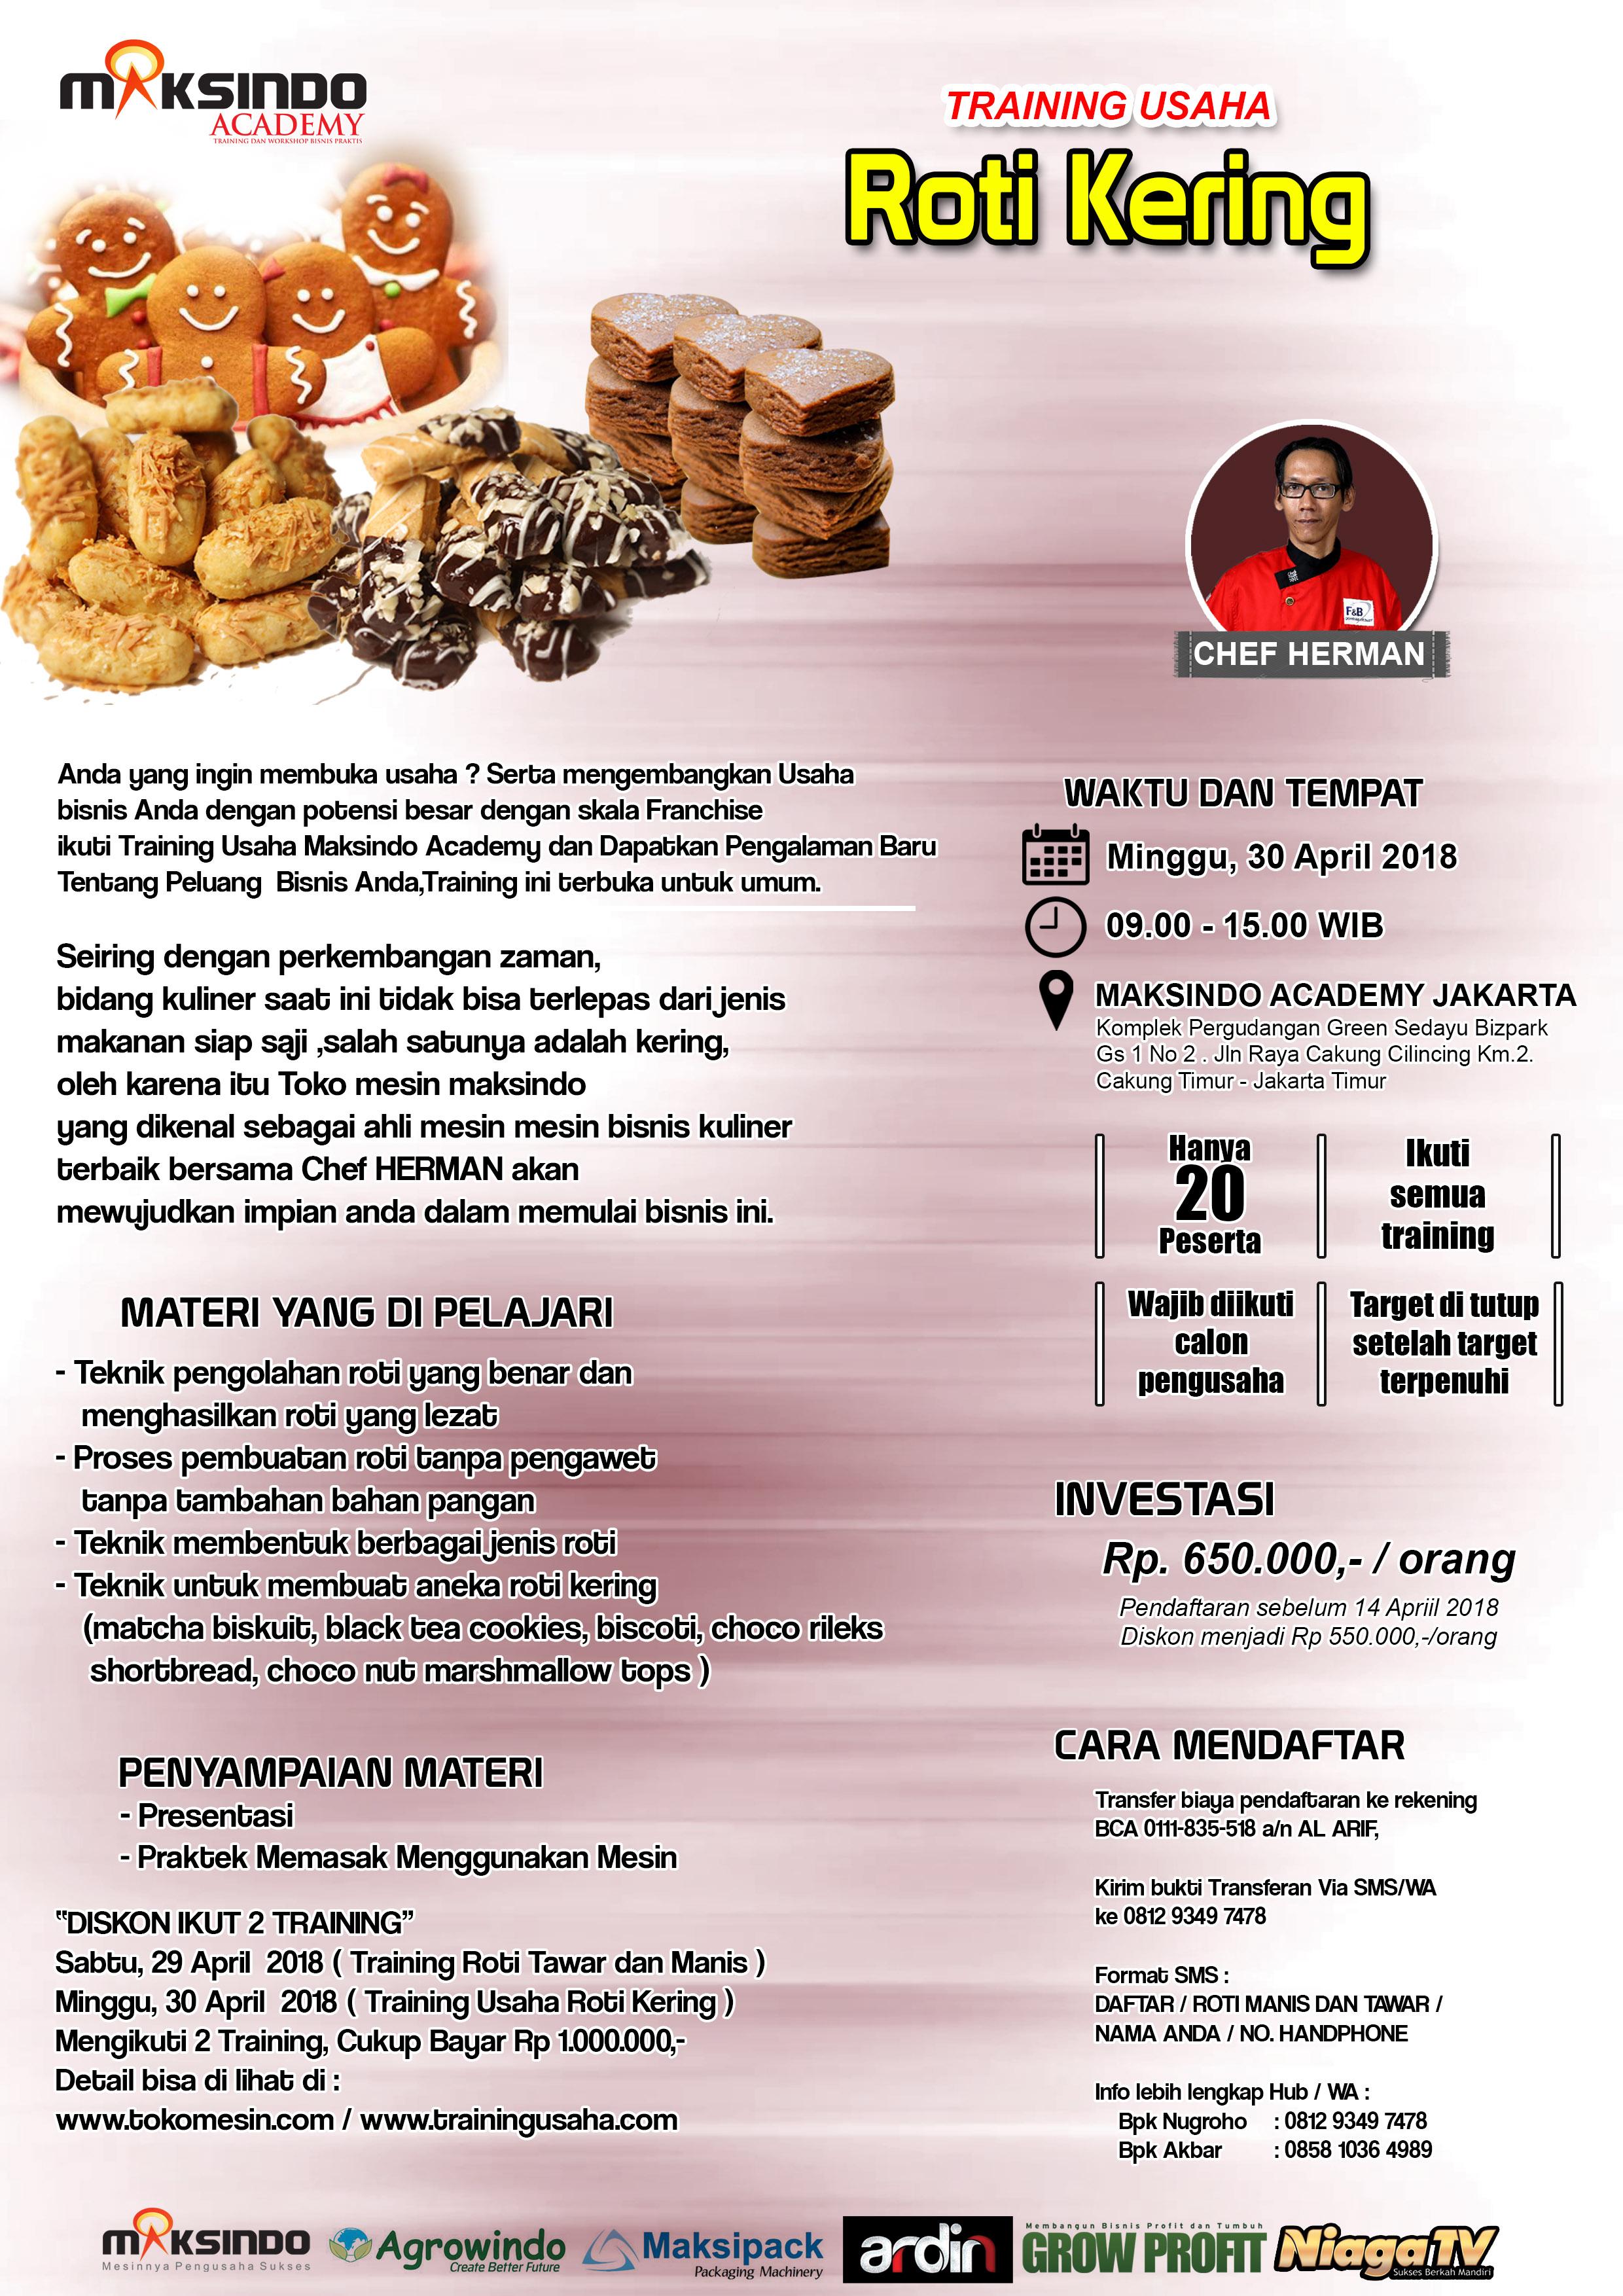 Training Usaha Roti Kering, 30 April 2018